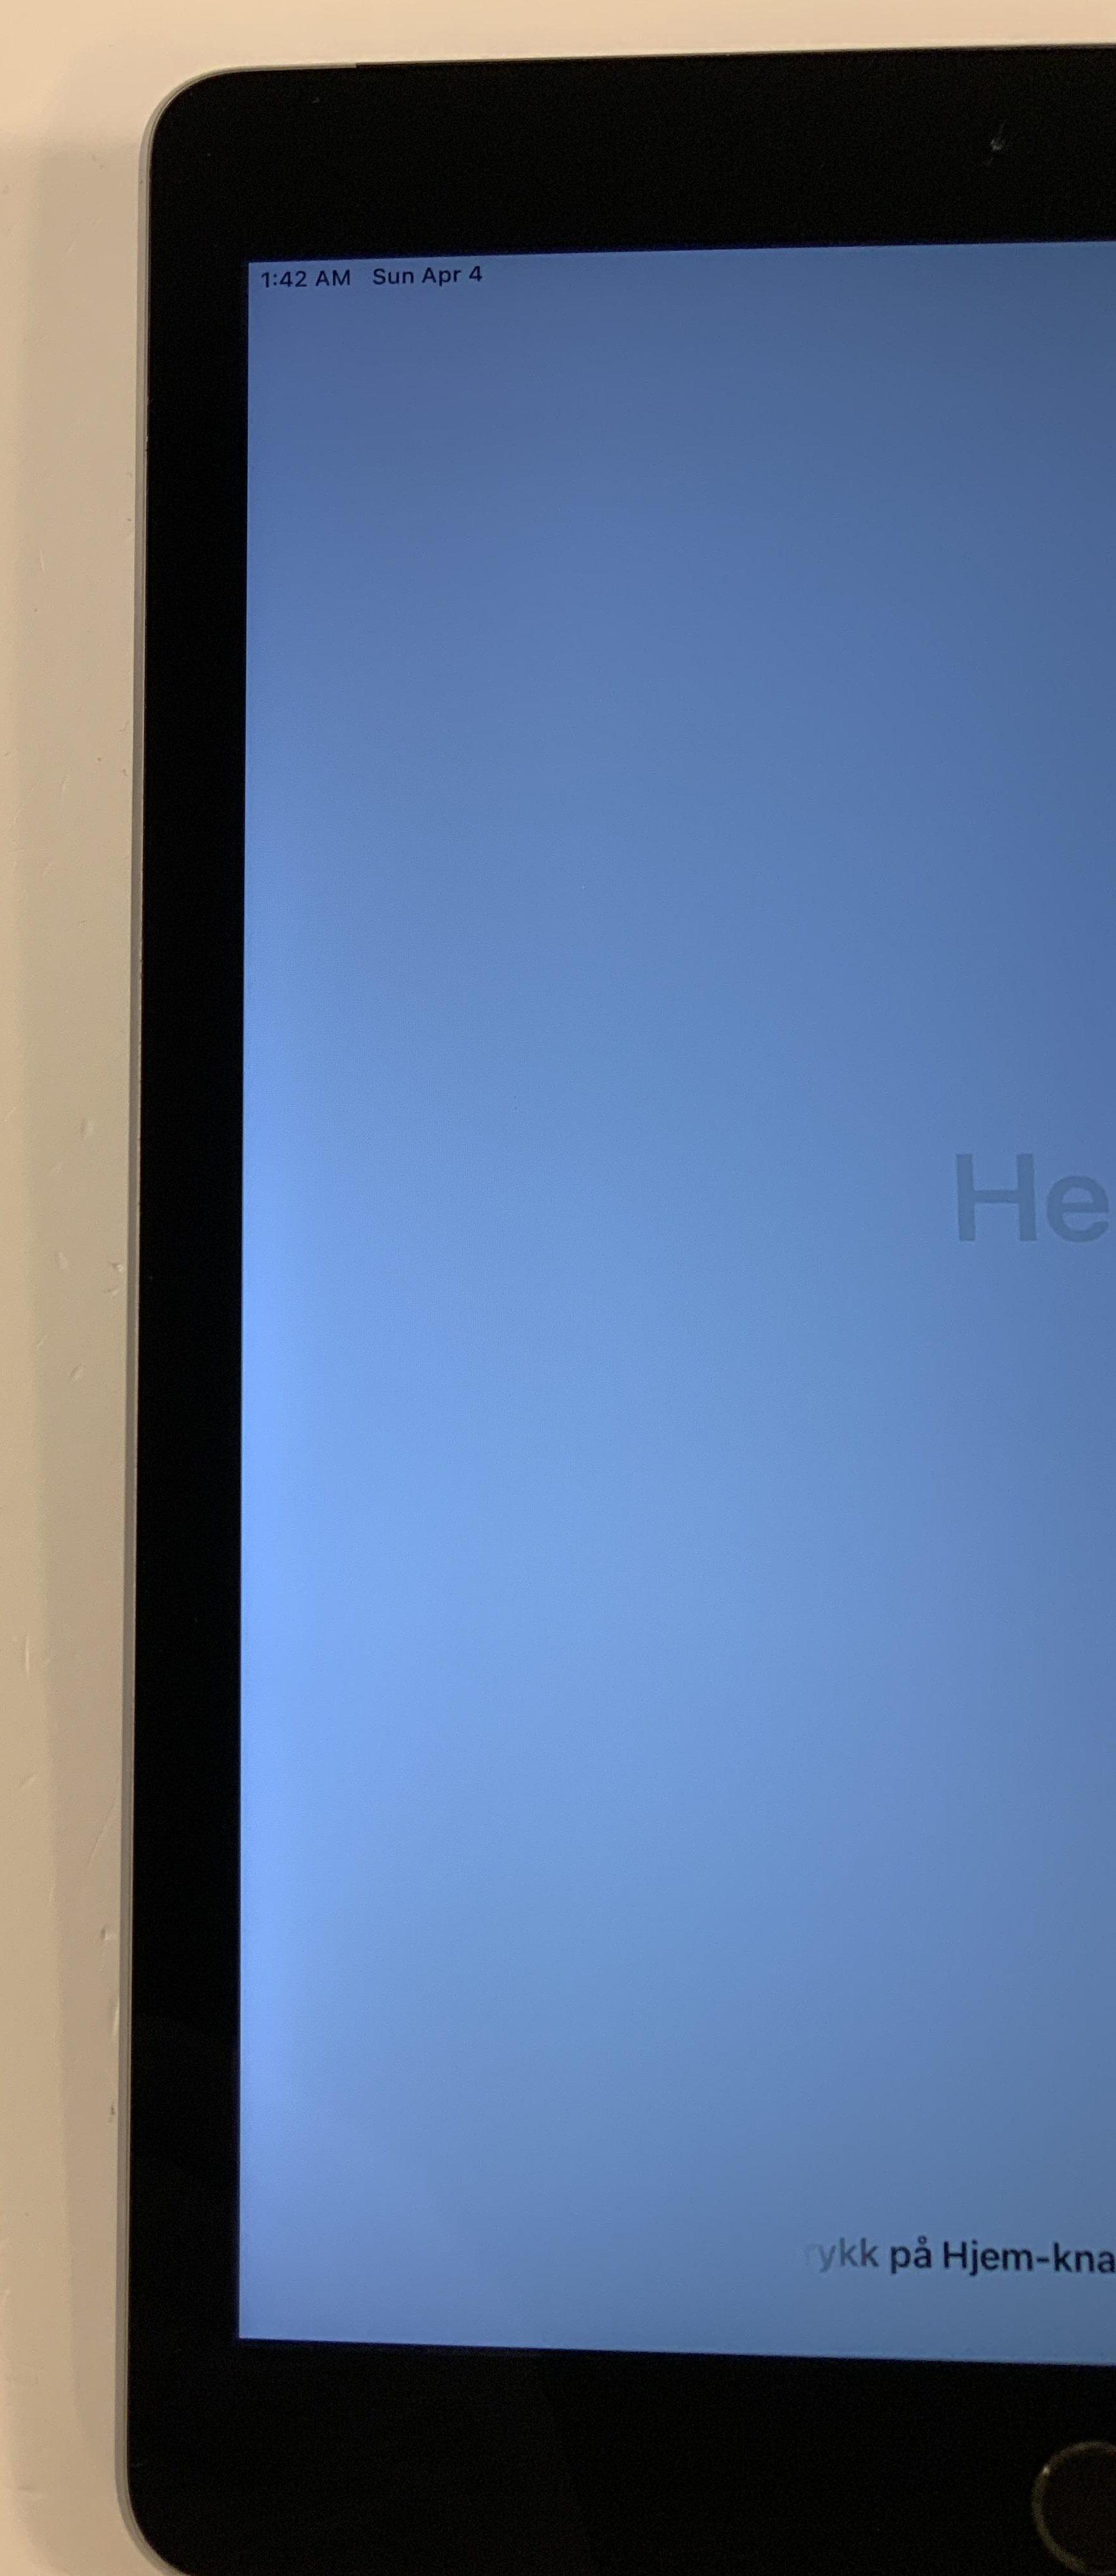 iPad Air 2 Wi-Fi + Cellular 64GB, 64GB, Space Gray, image 5